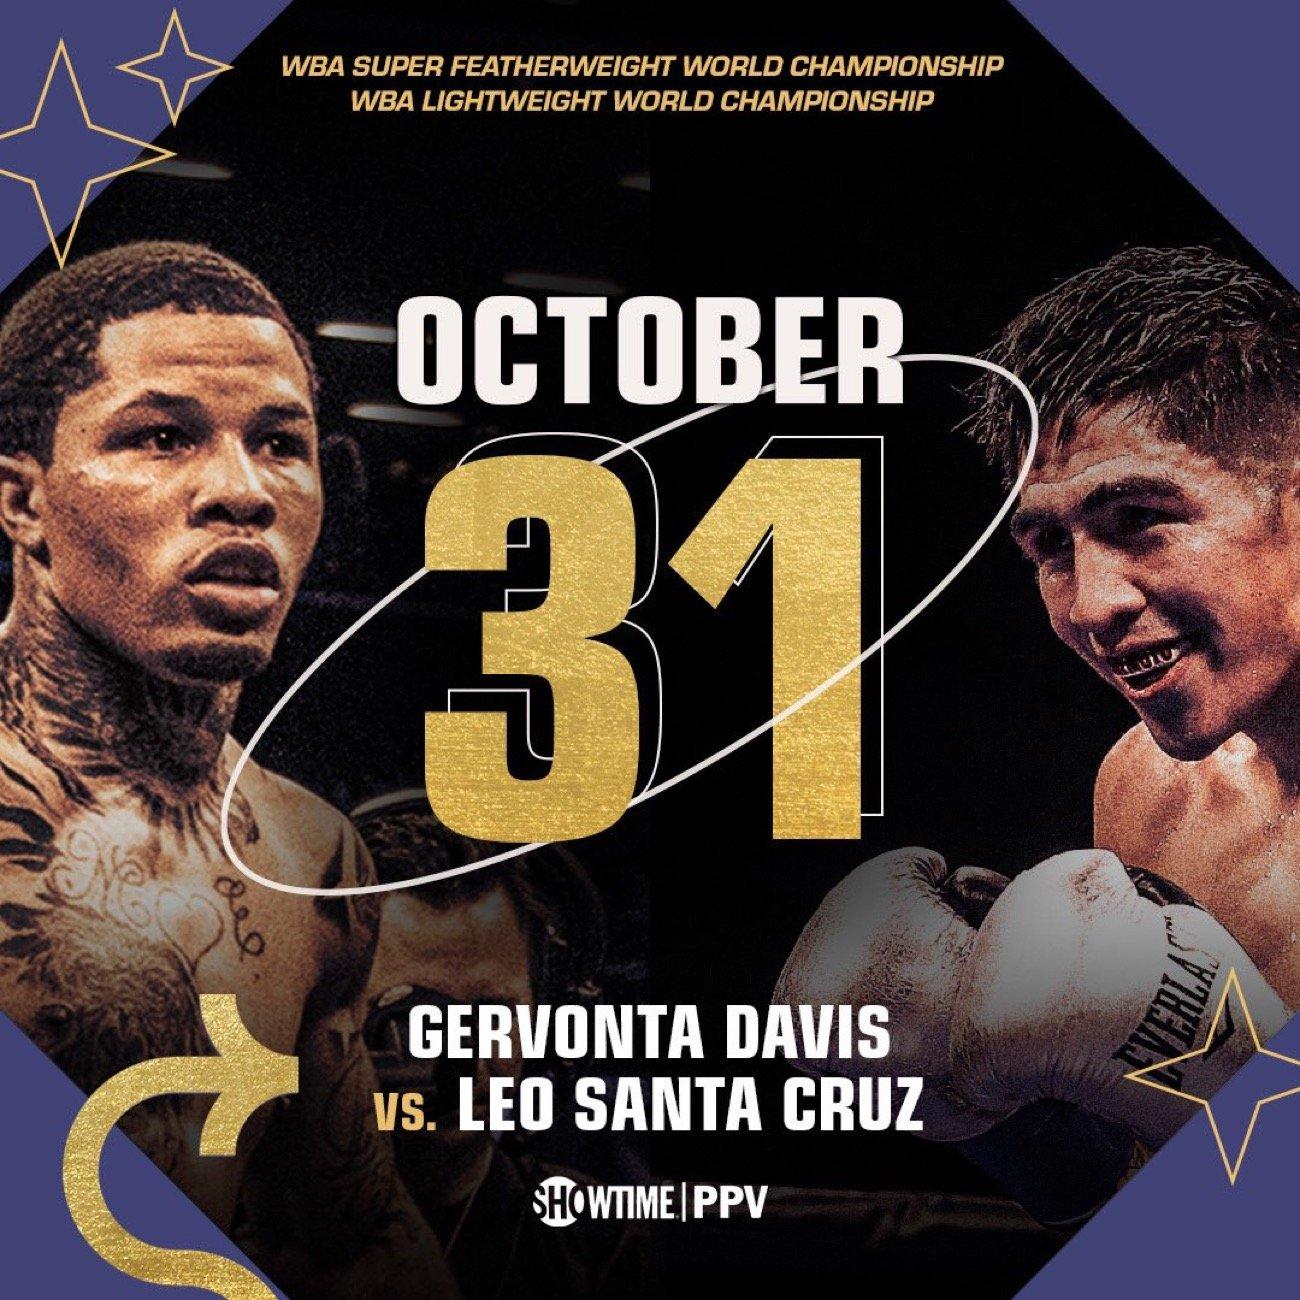 Santa Cruz Halloween 2020 Gervonta Davis and Leo Santa Cruz to fight on Halloween on Oct.31